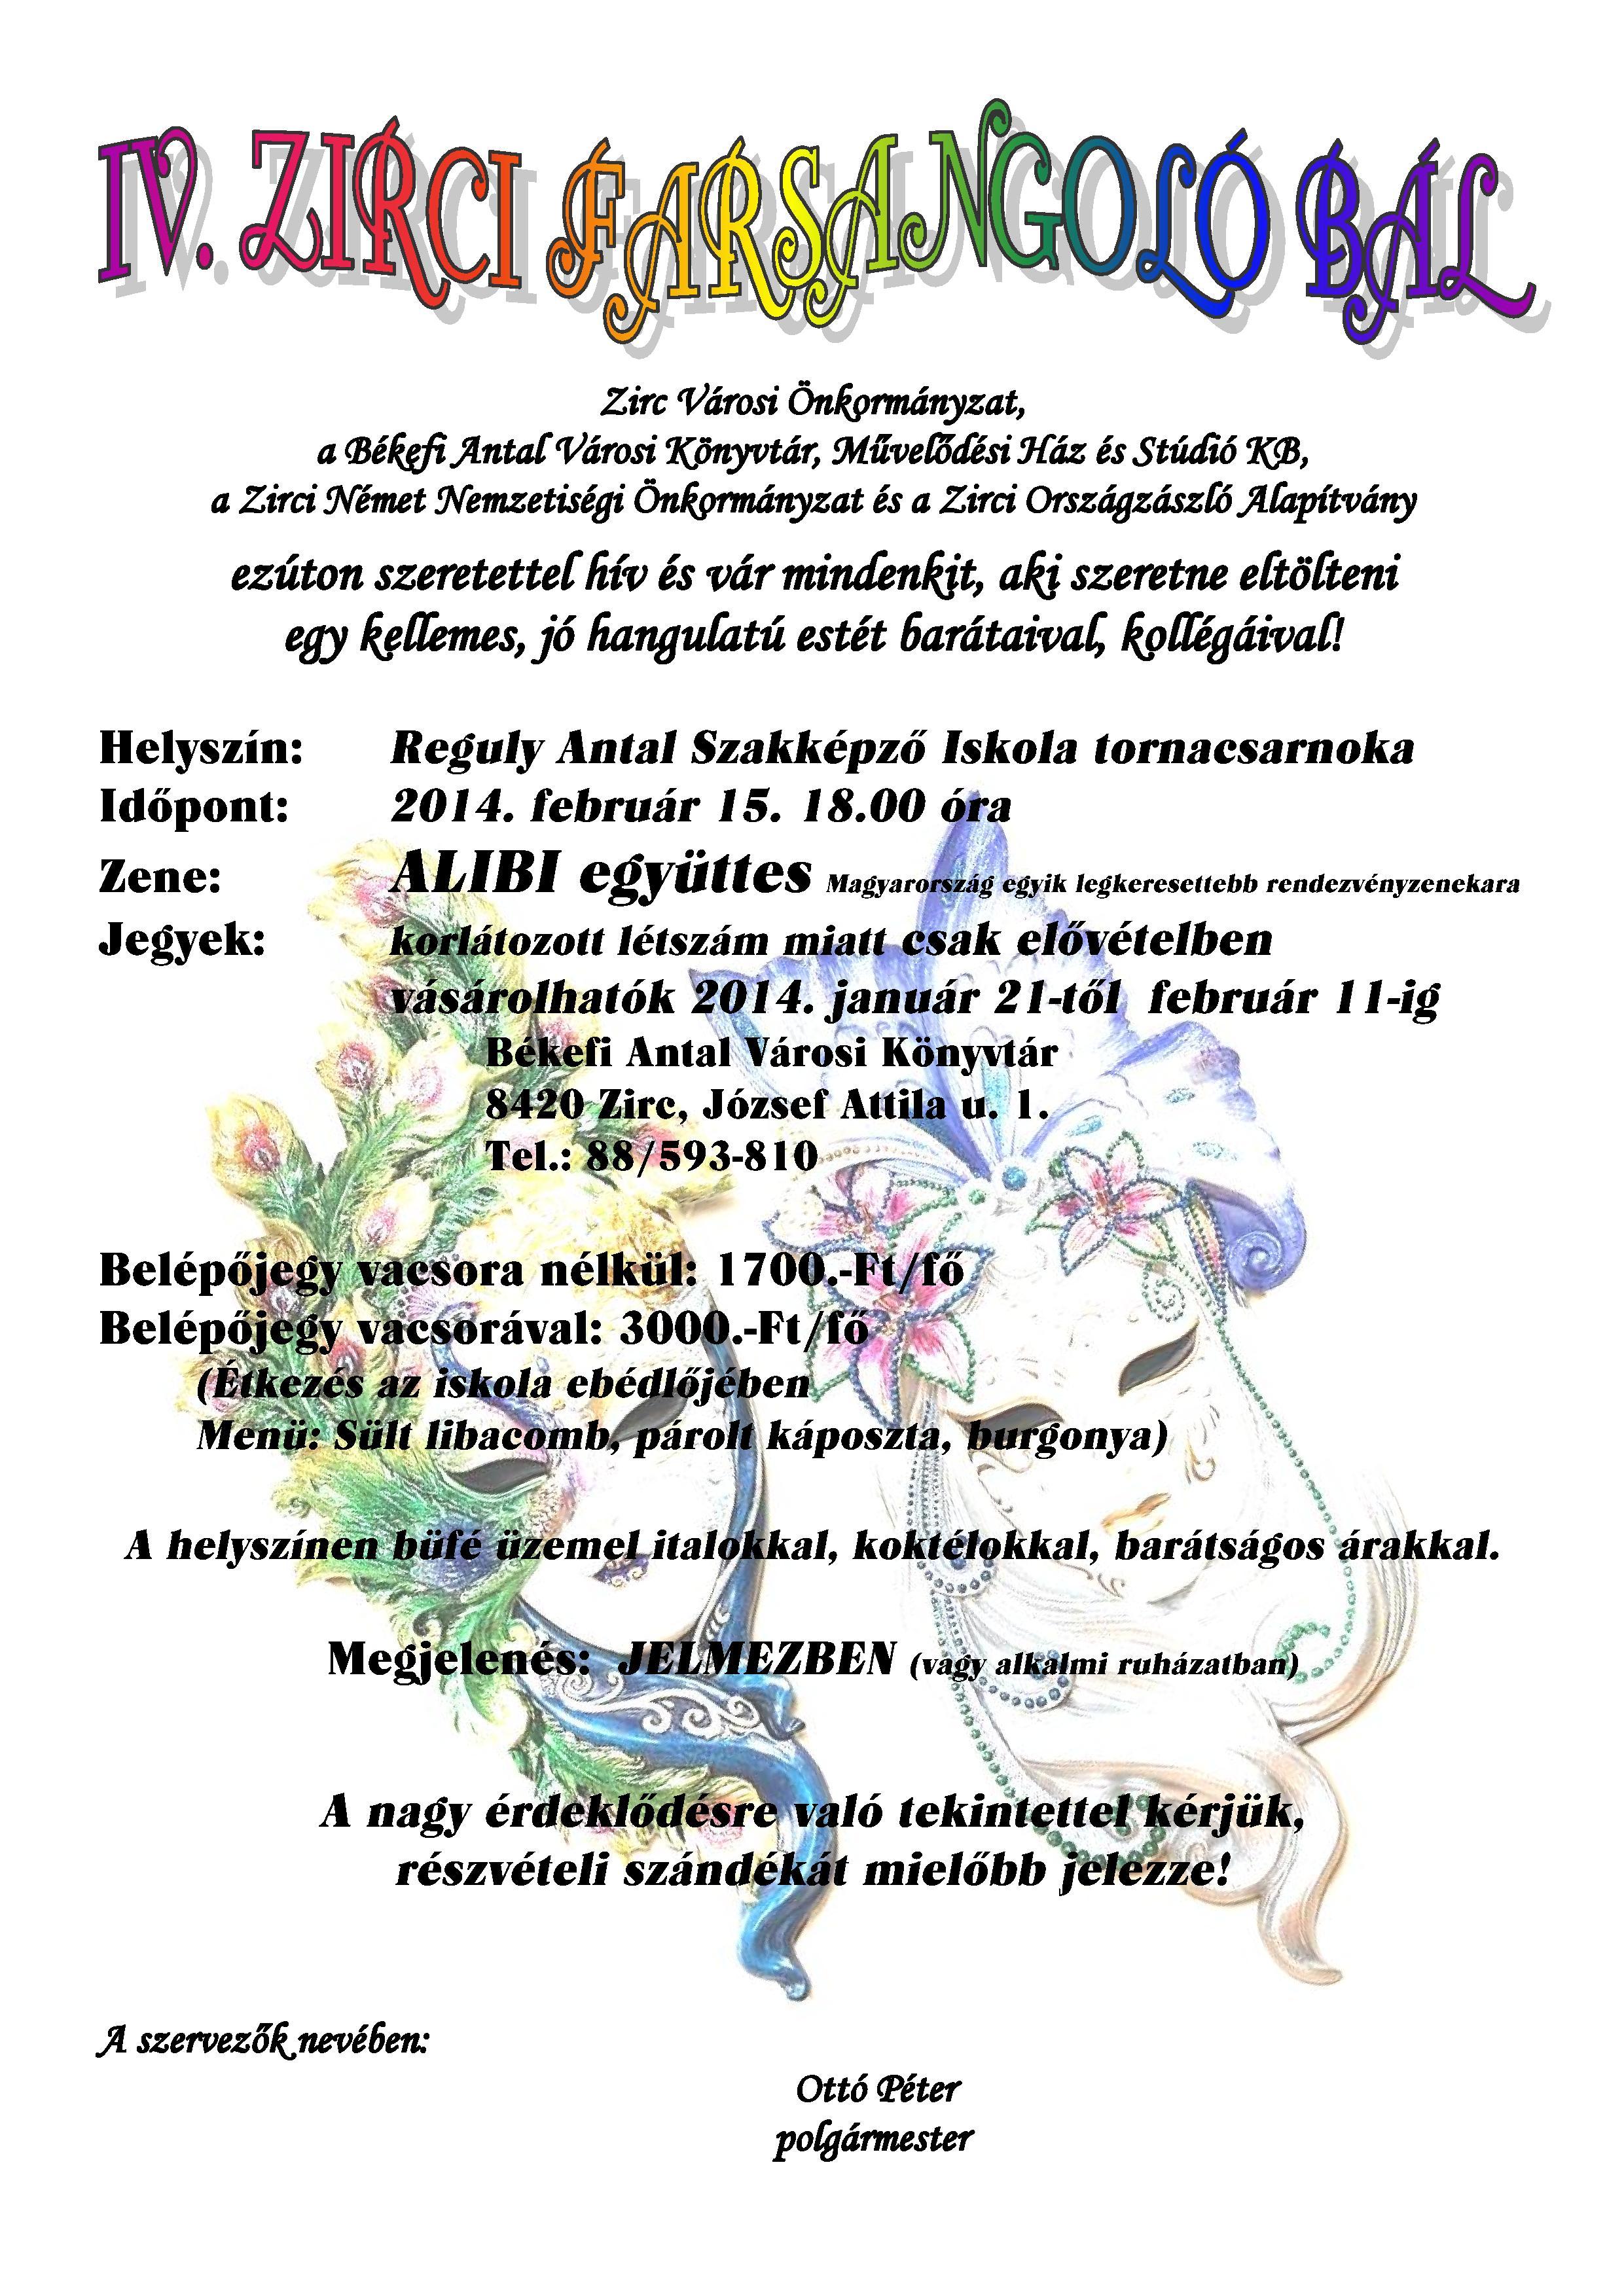 4. zirci farsangoló bál-page-001.jpg